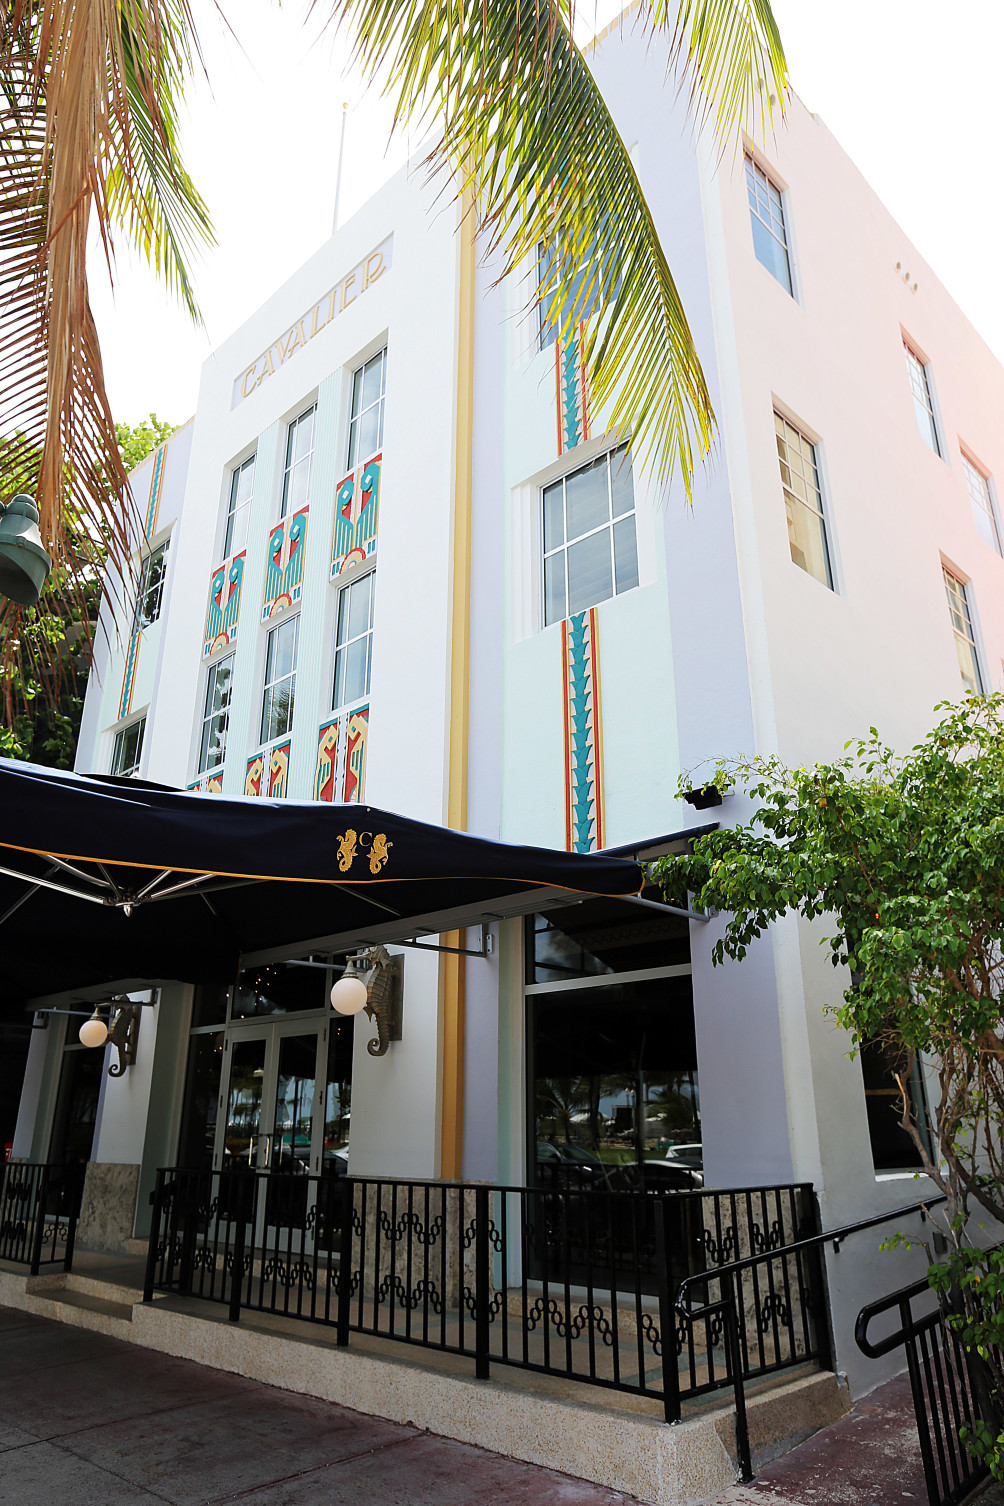 HotelCavalier Hotel South Beach